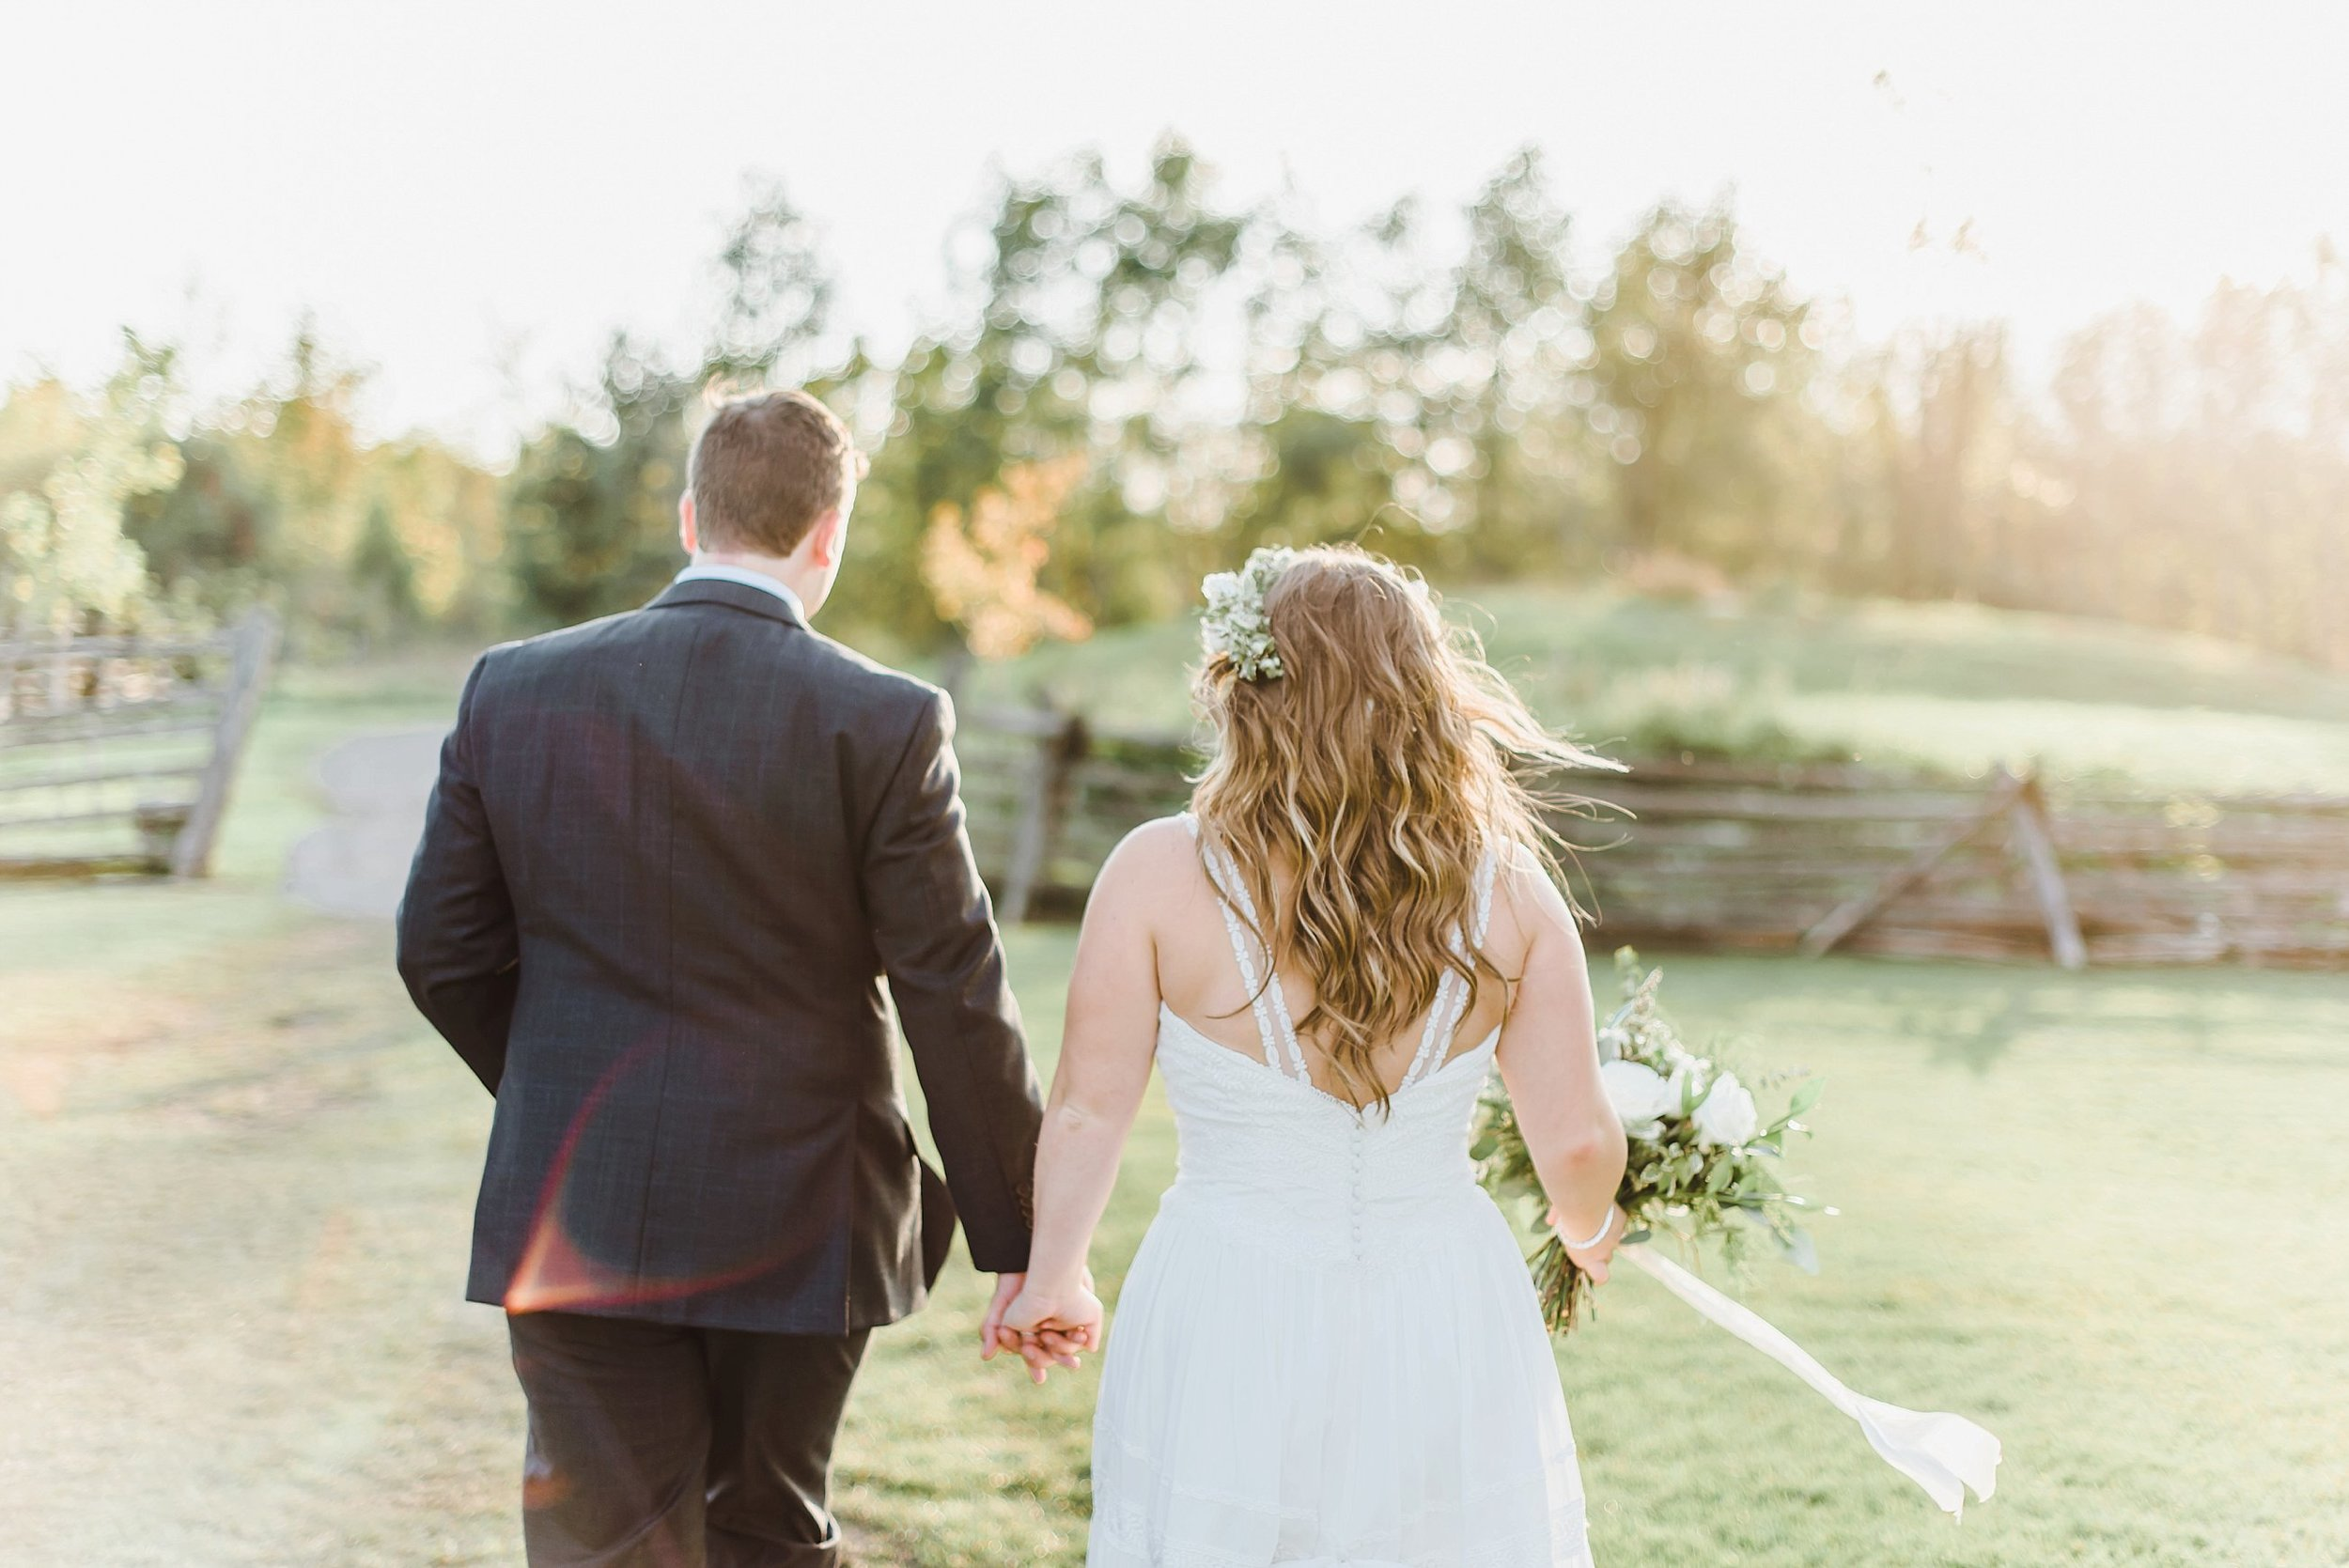 light airy indie fine art ottawa wedding photographer | Ali and Batoul Photography_1196.jpg